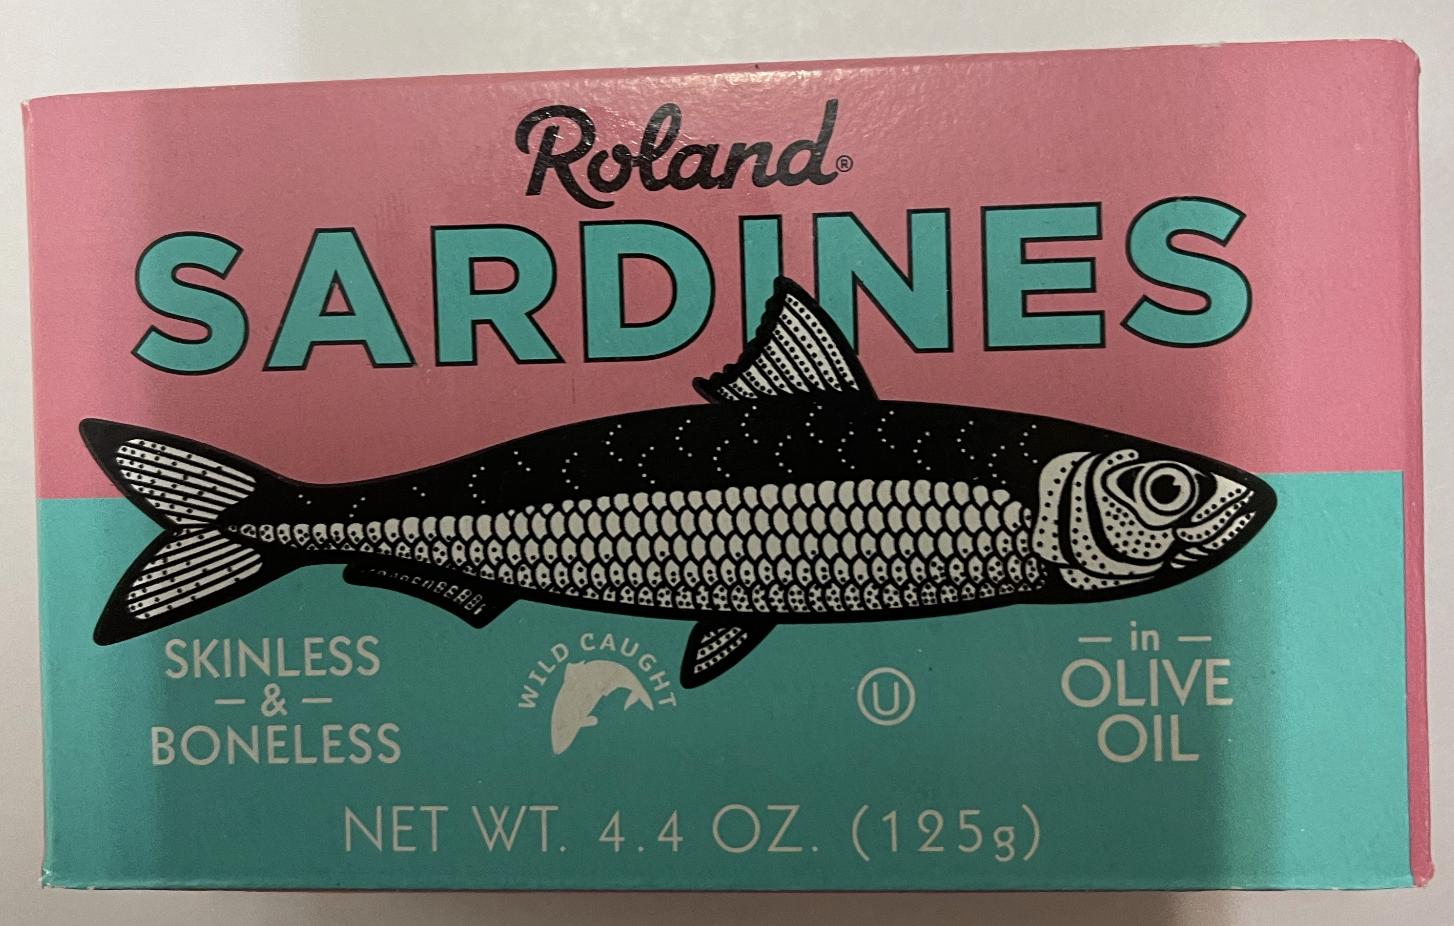 Skinless / Boneless Sardines 4.4 Oz. Roland